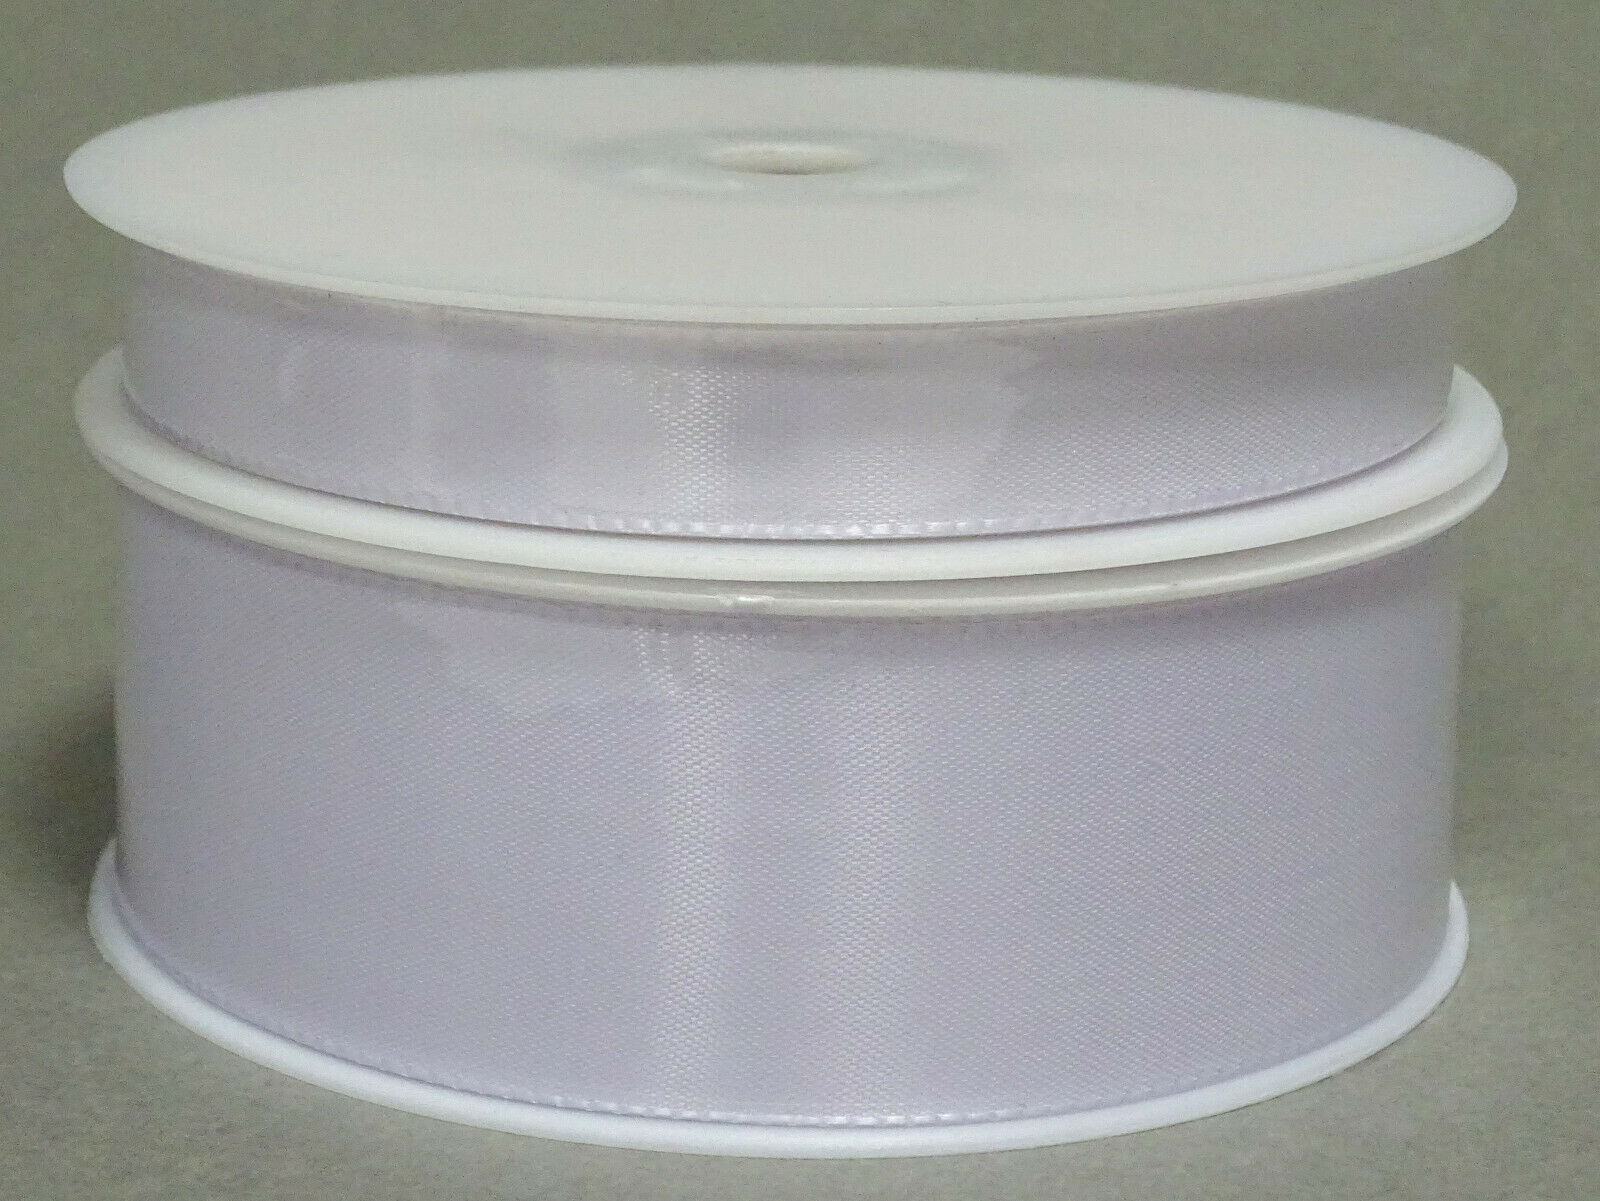 Seidenband Schleifenband 50 m x 15 / 25 / 40mm Dekoband ab 0,08€/m Geschenkband  - Weiß 101, 15 mm x 50 m